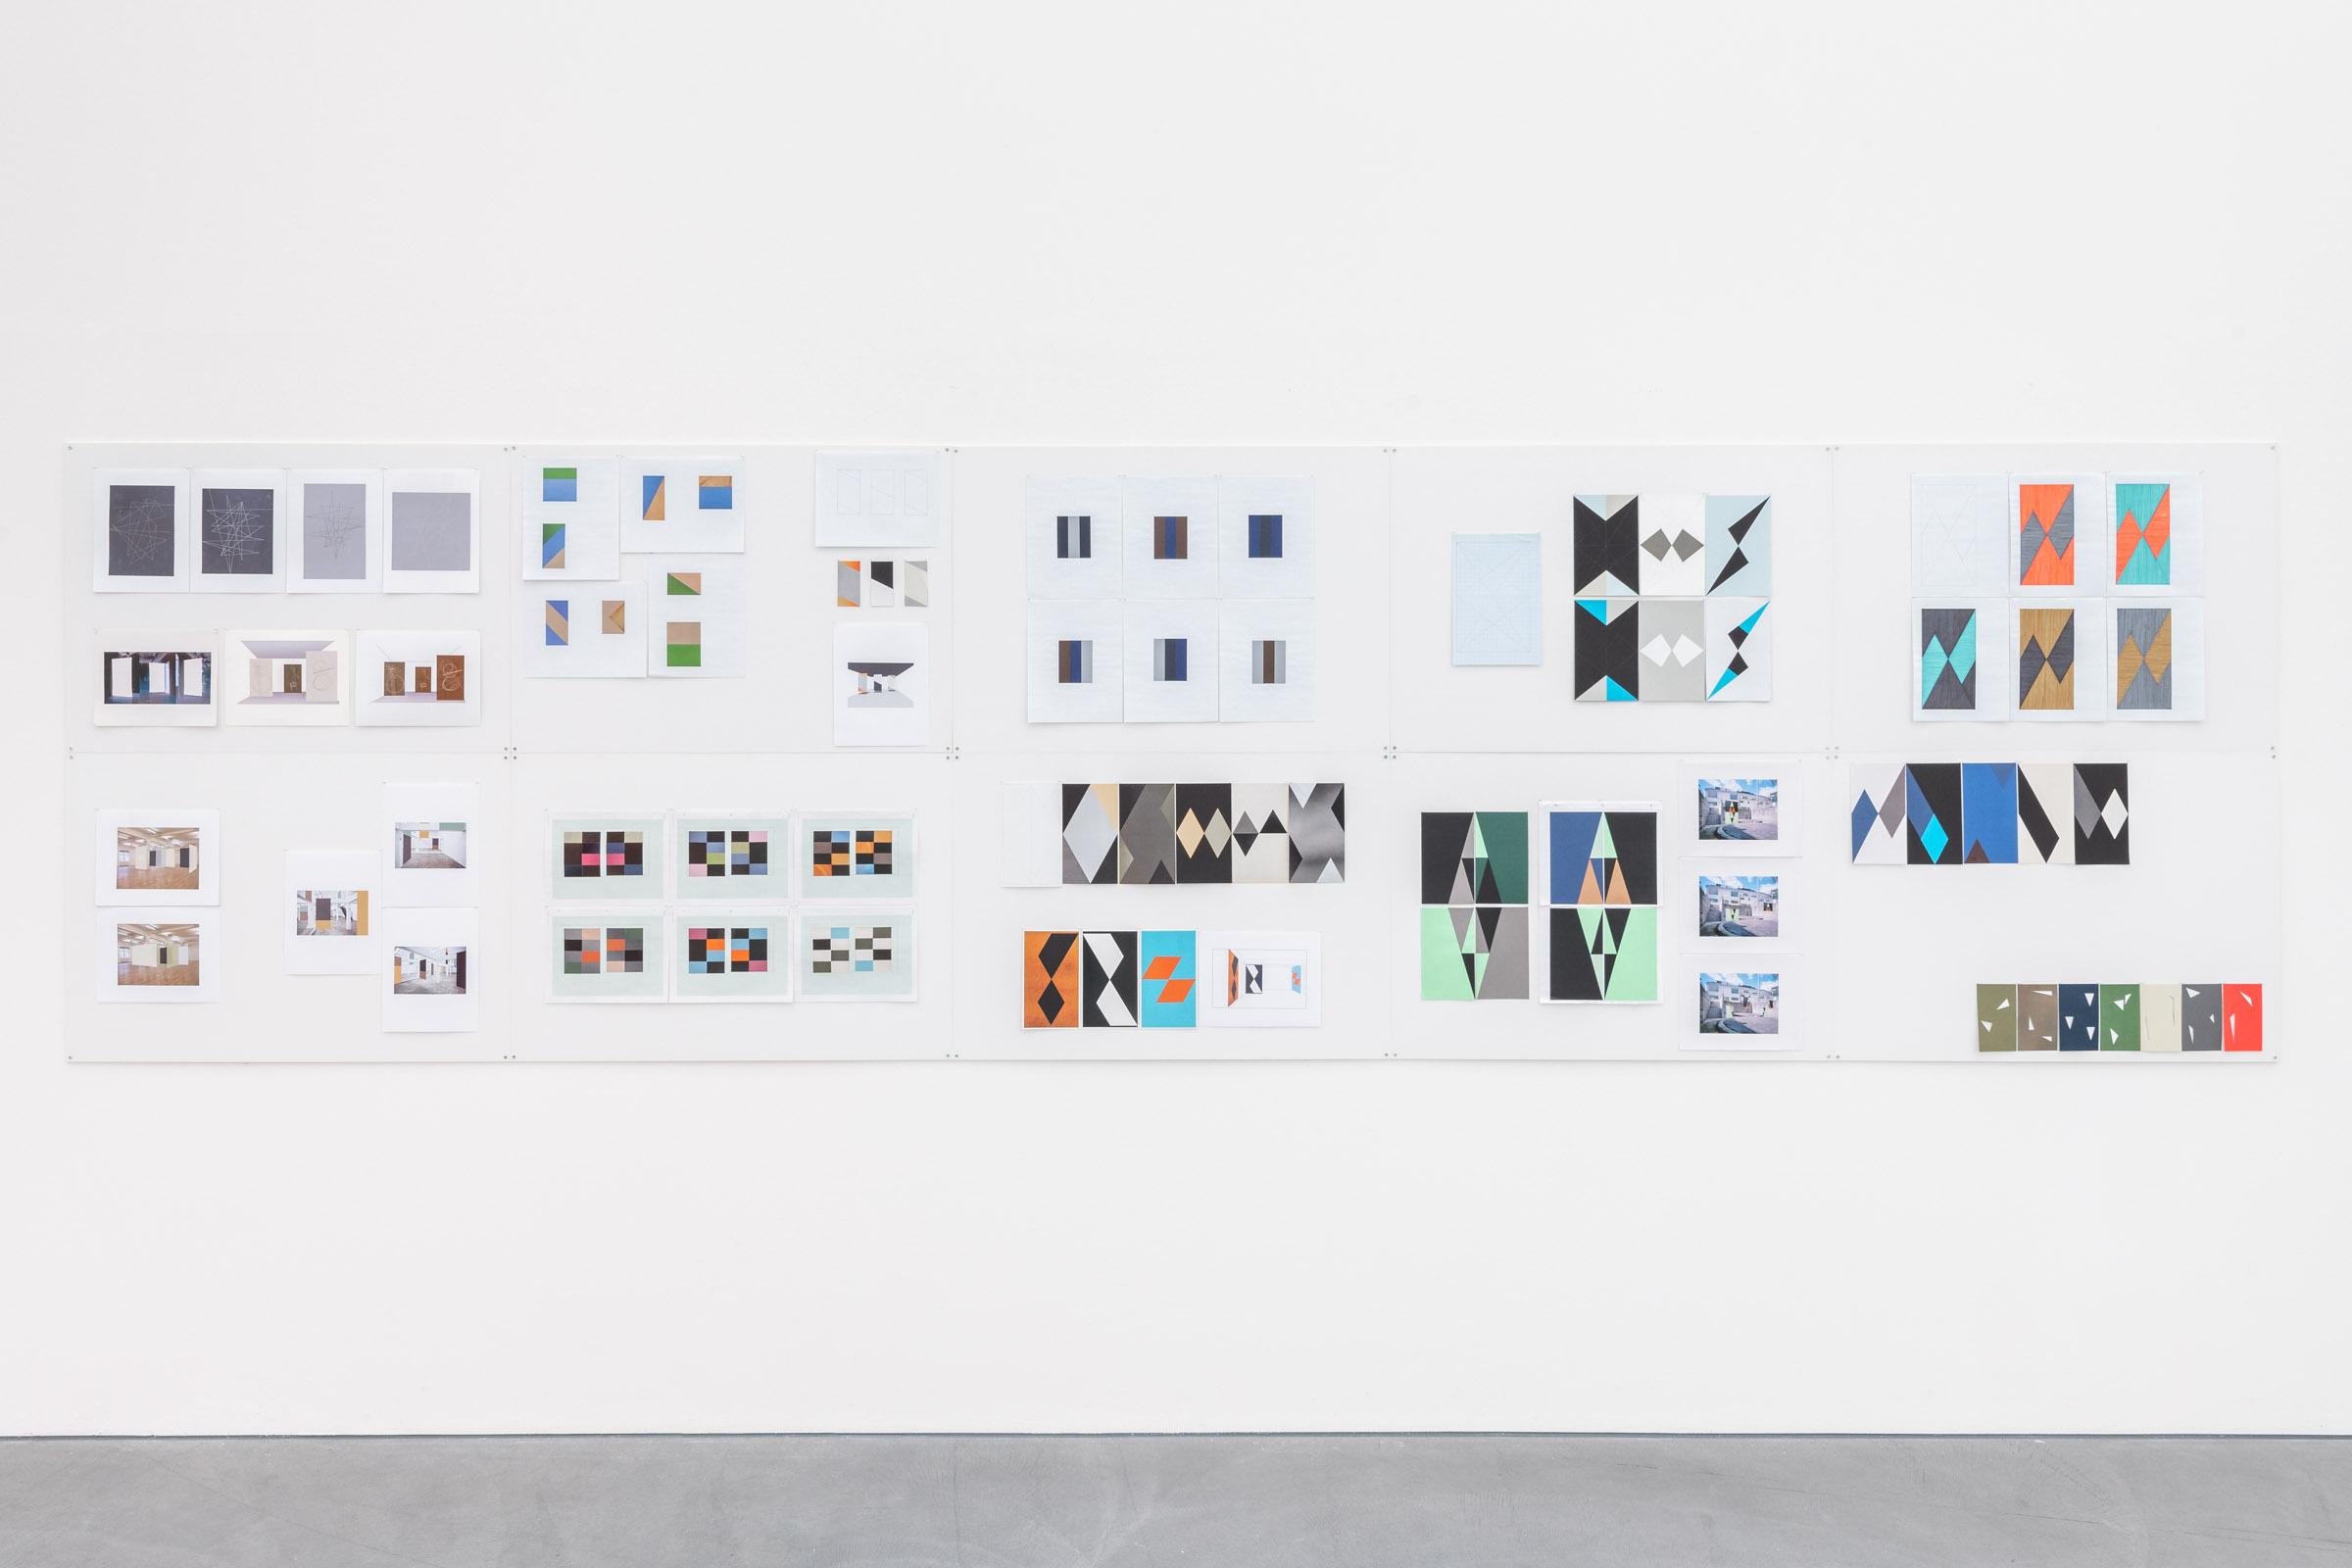 Miklos von Bartha recalls his first encounter with Arte Concreto and Arte Madí